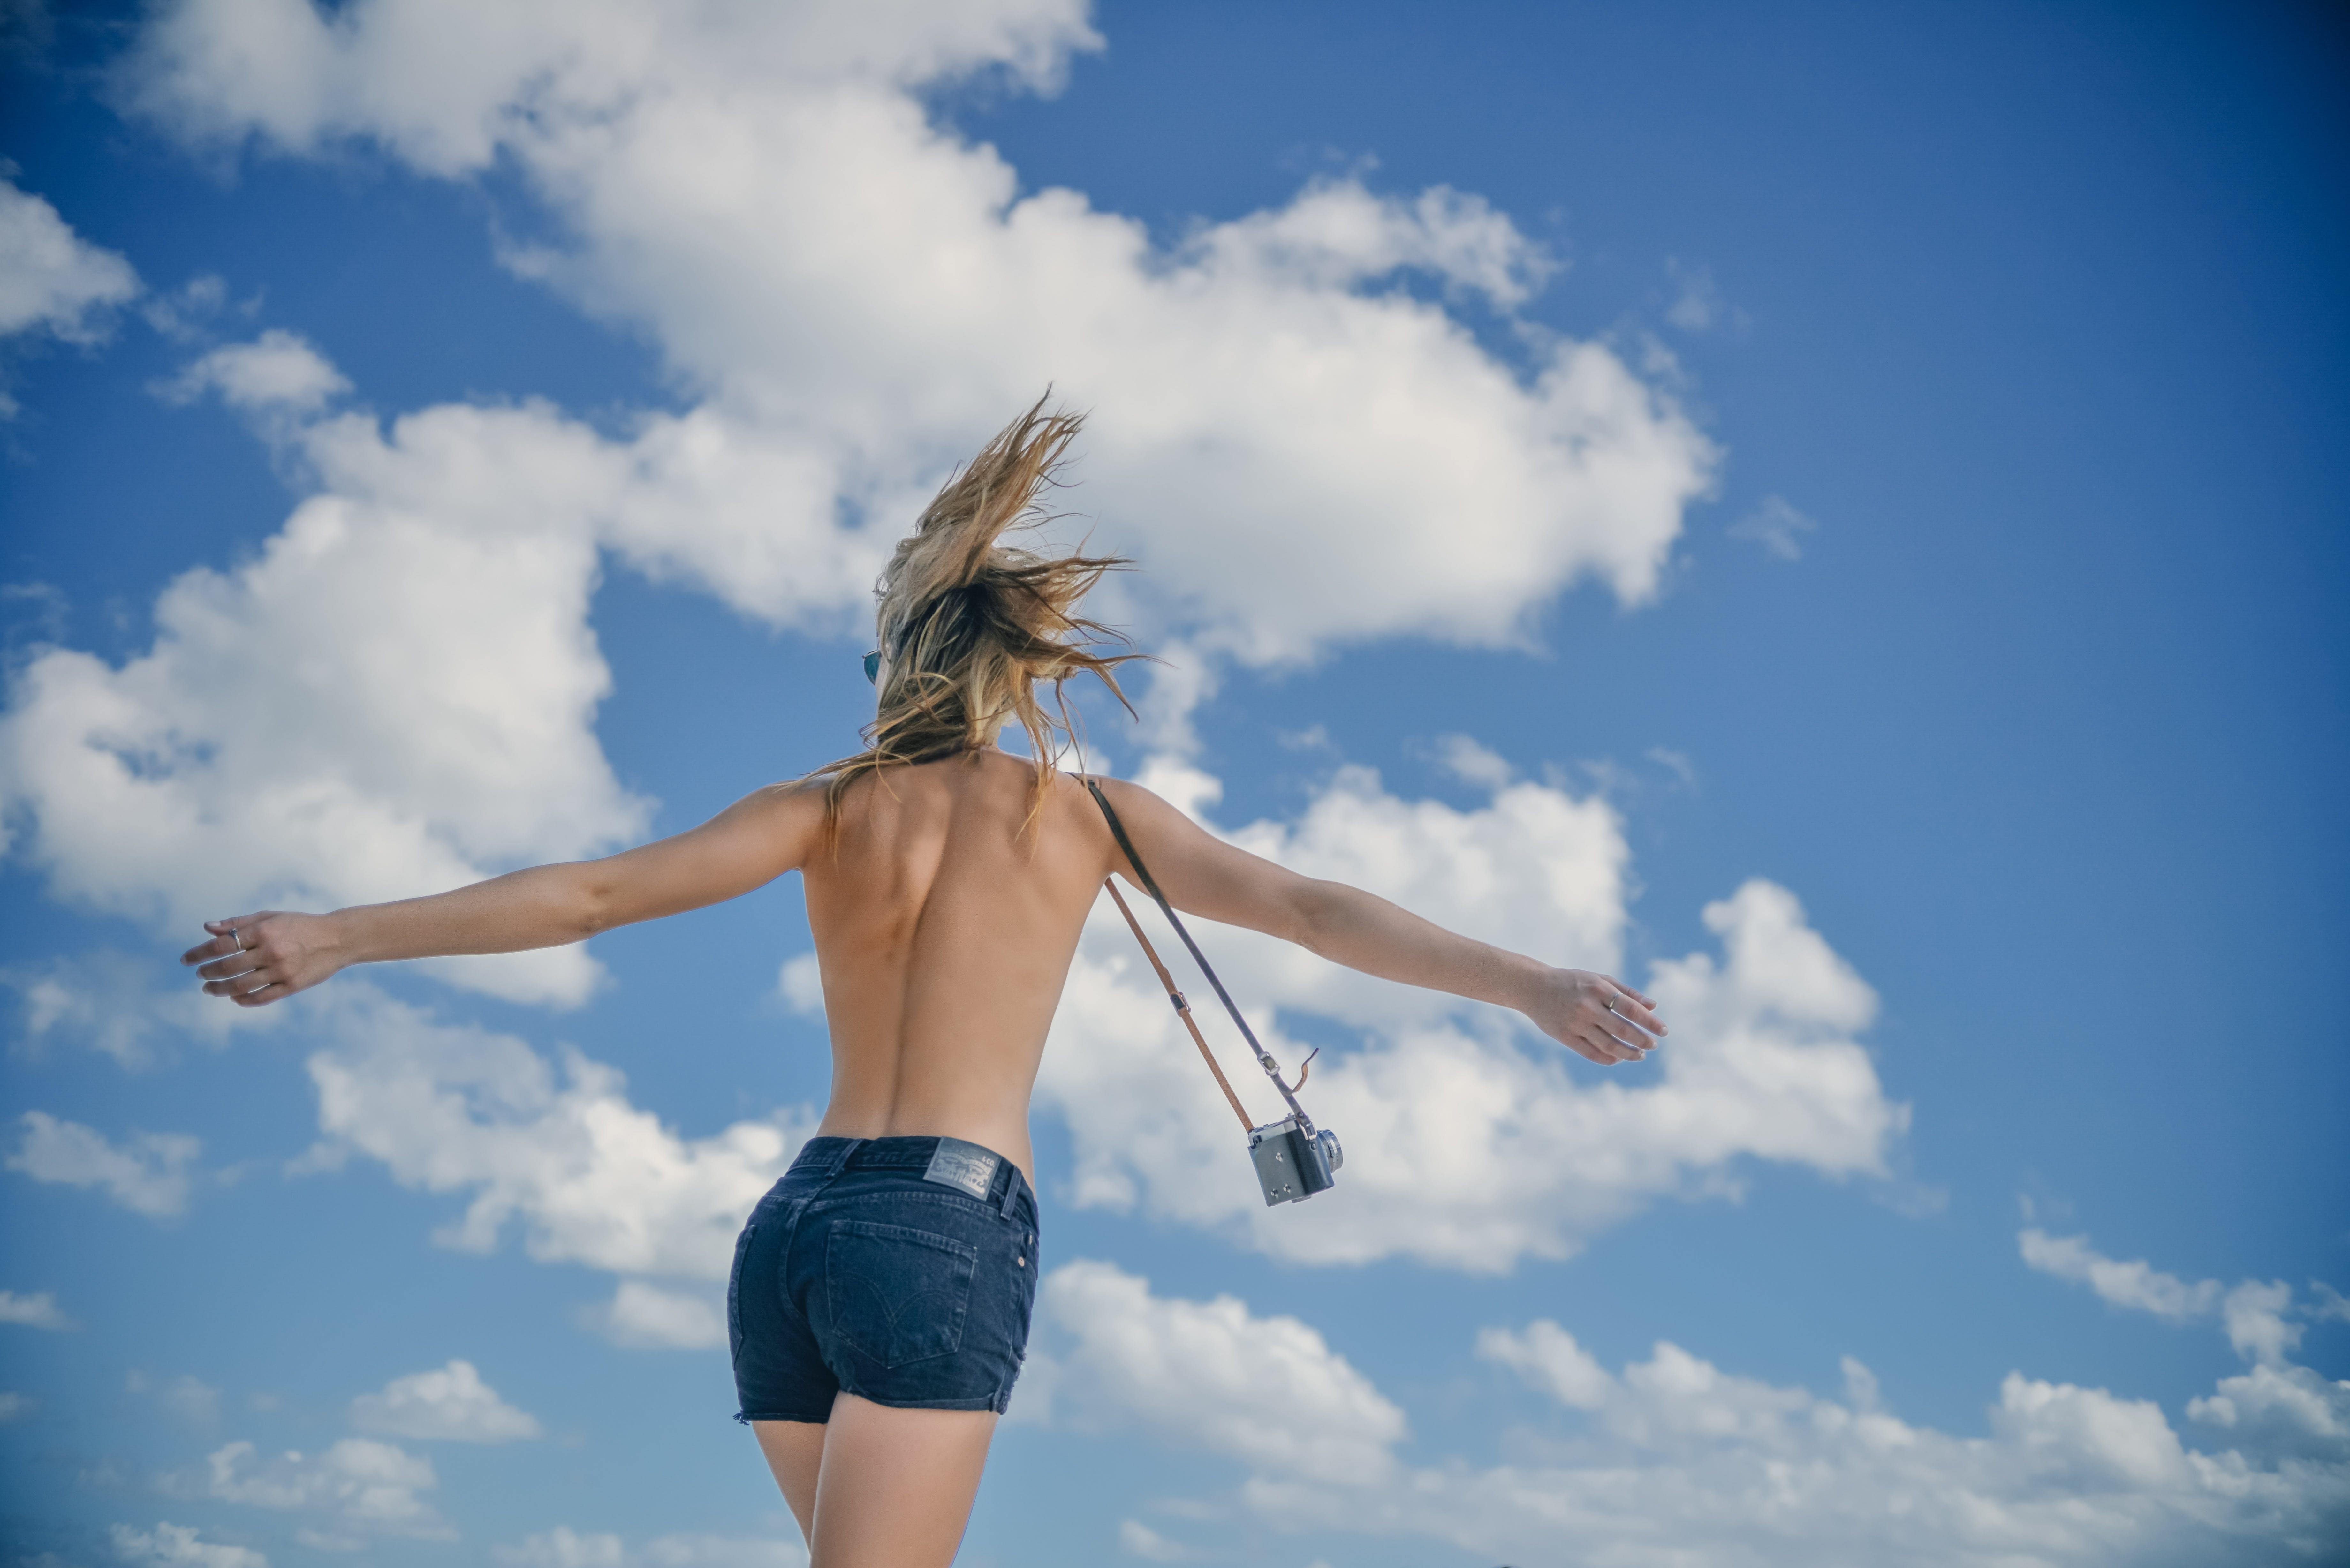 Topless Woman Wearing Blue Denim Short Shorts Doing Open Arms